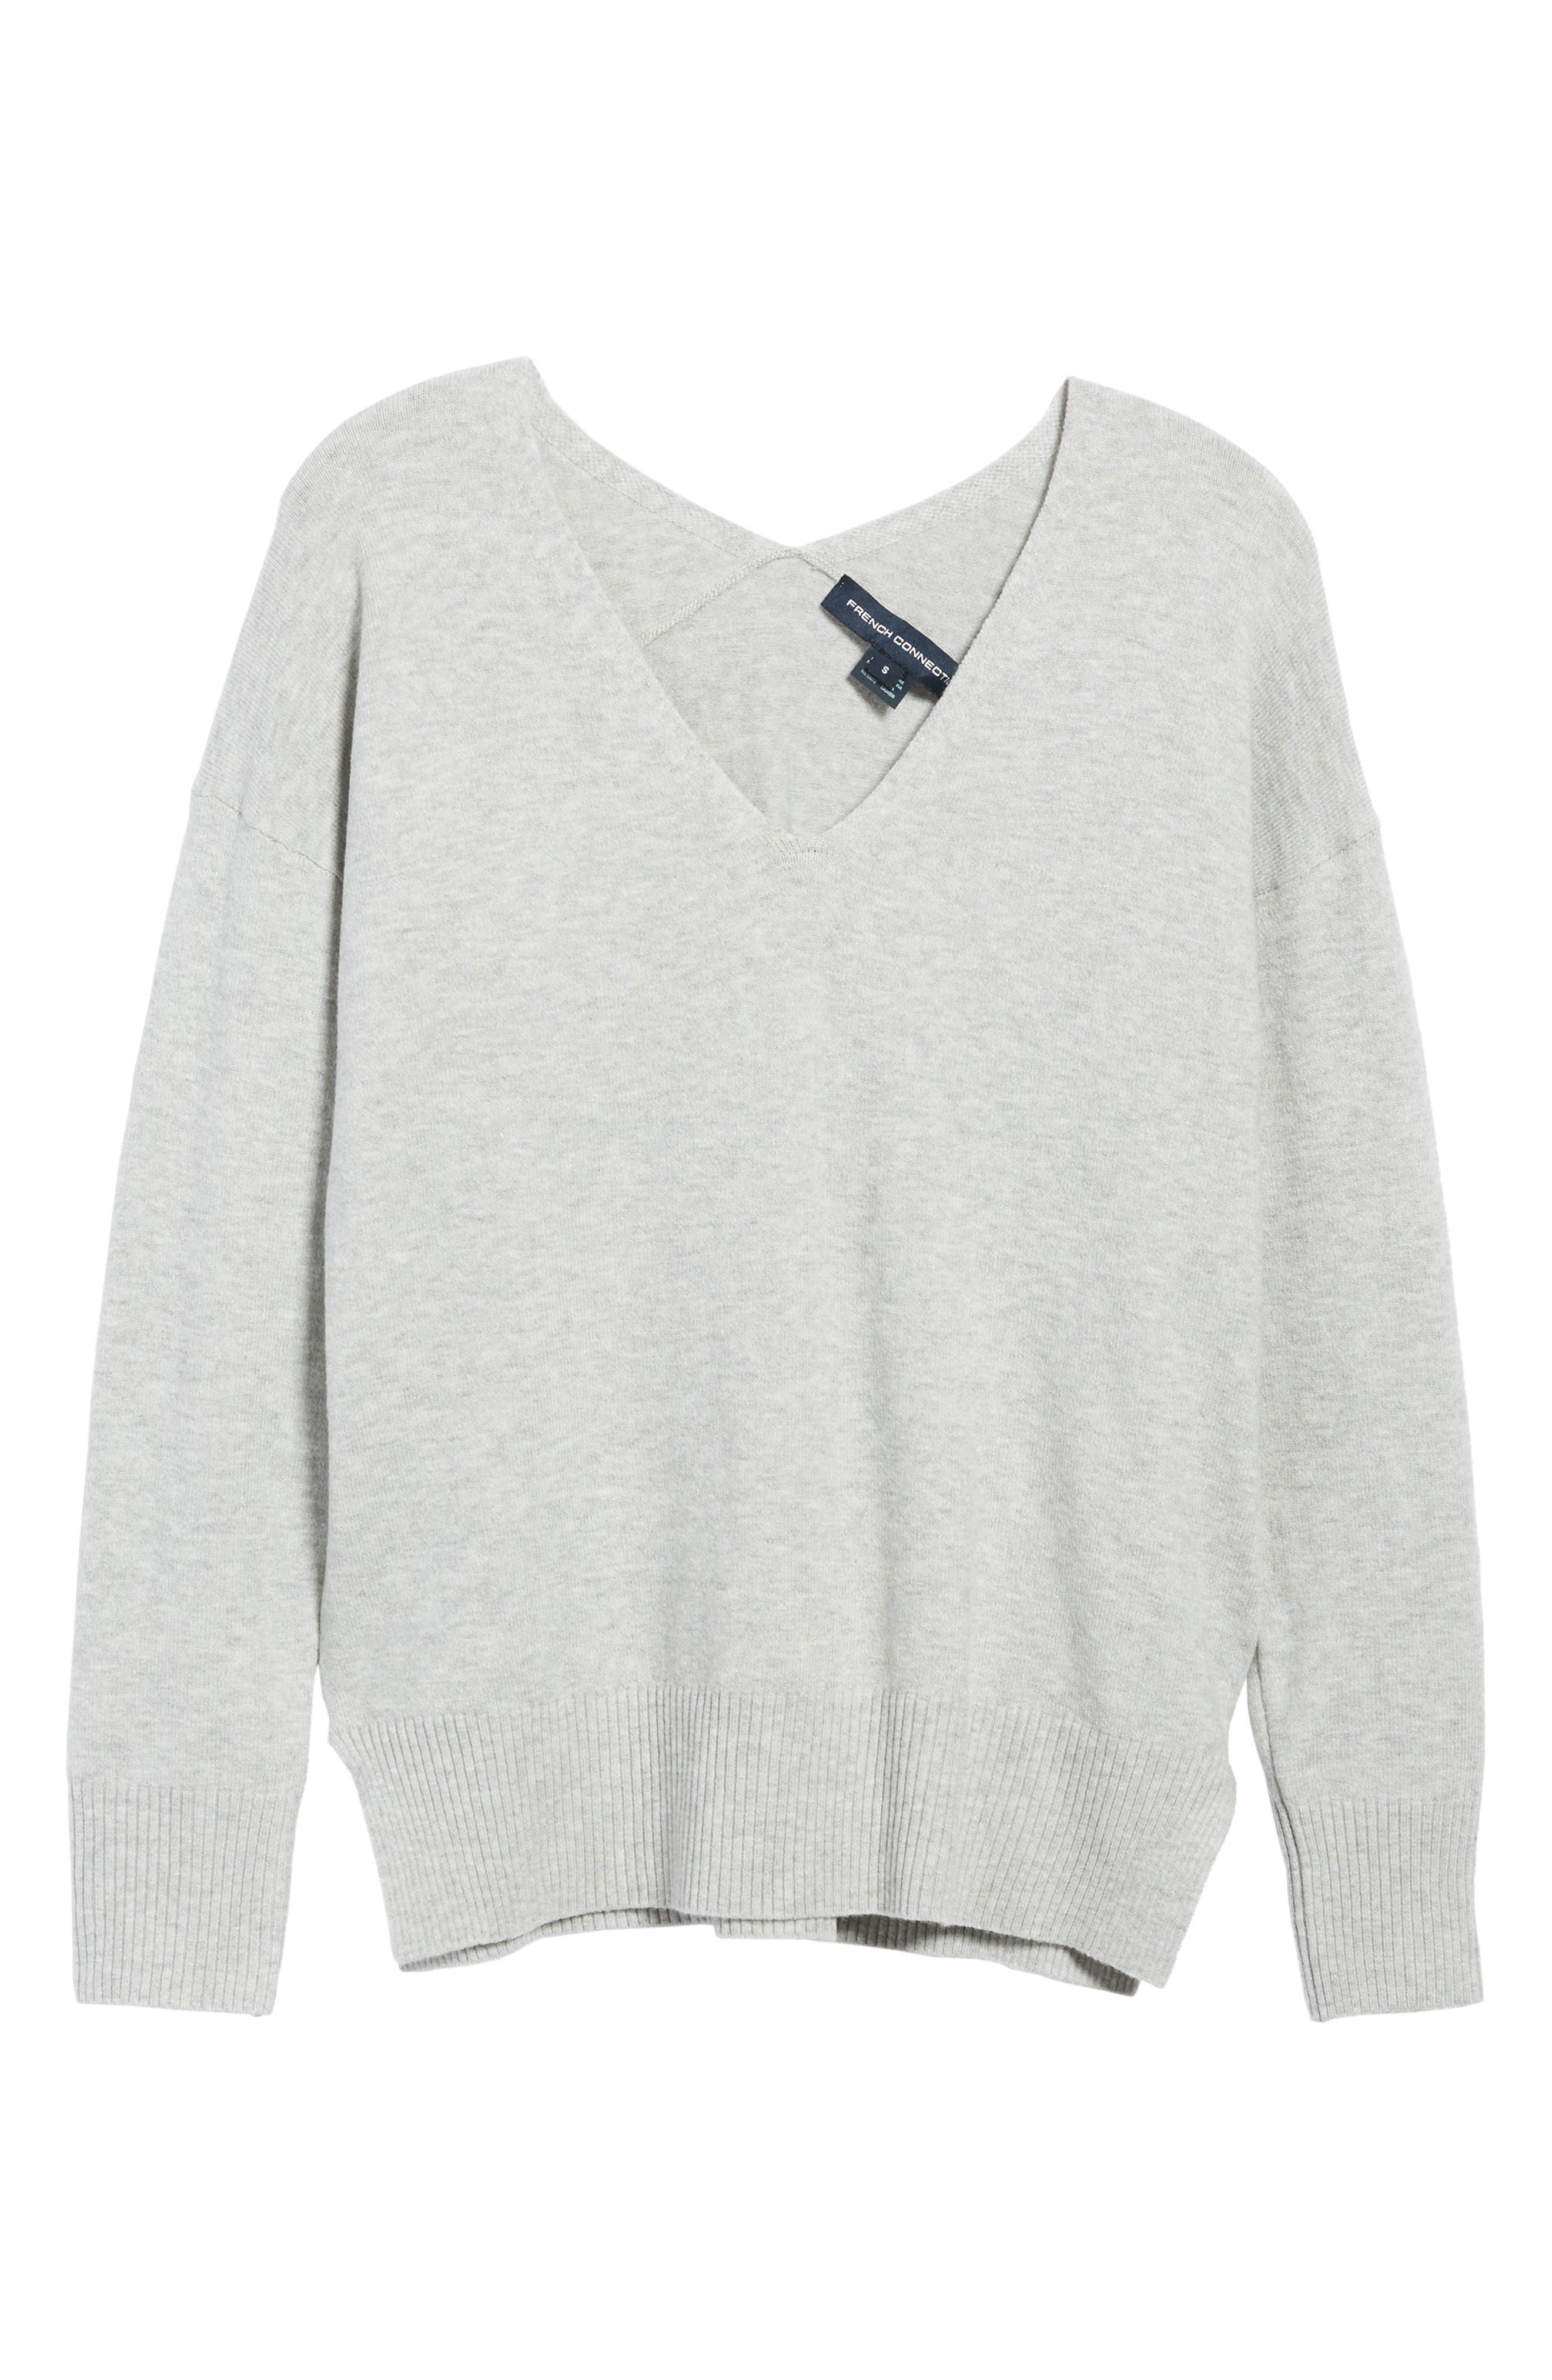 Main Image - French Connection Della Vhari V-Neck Sweater